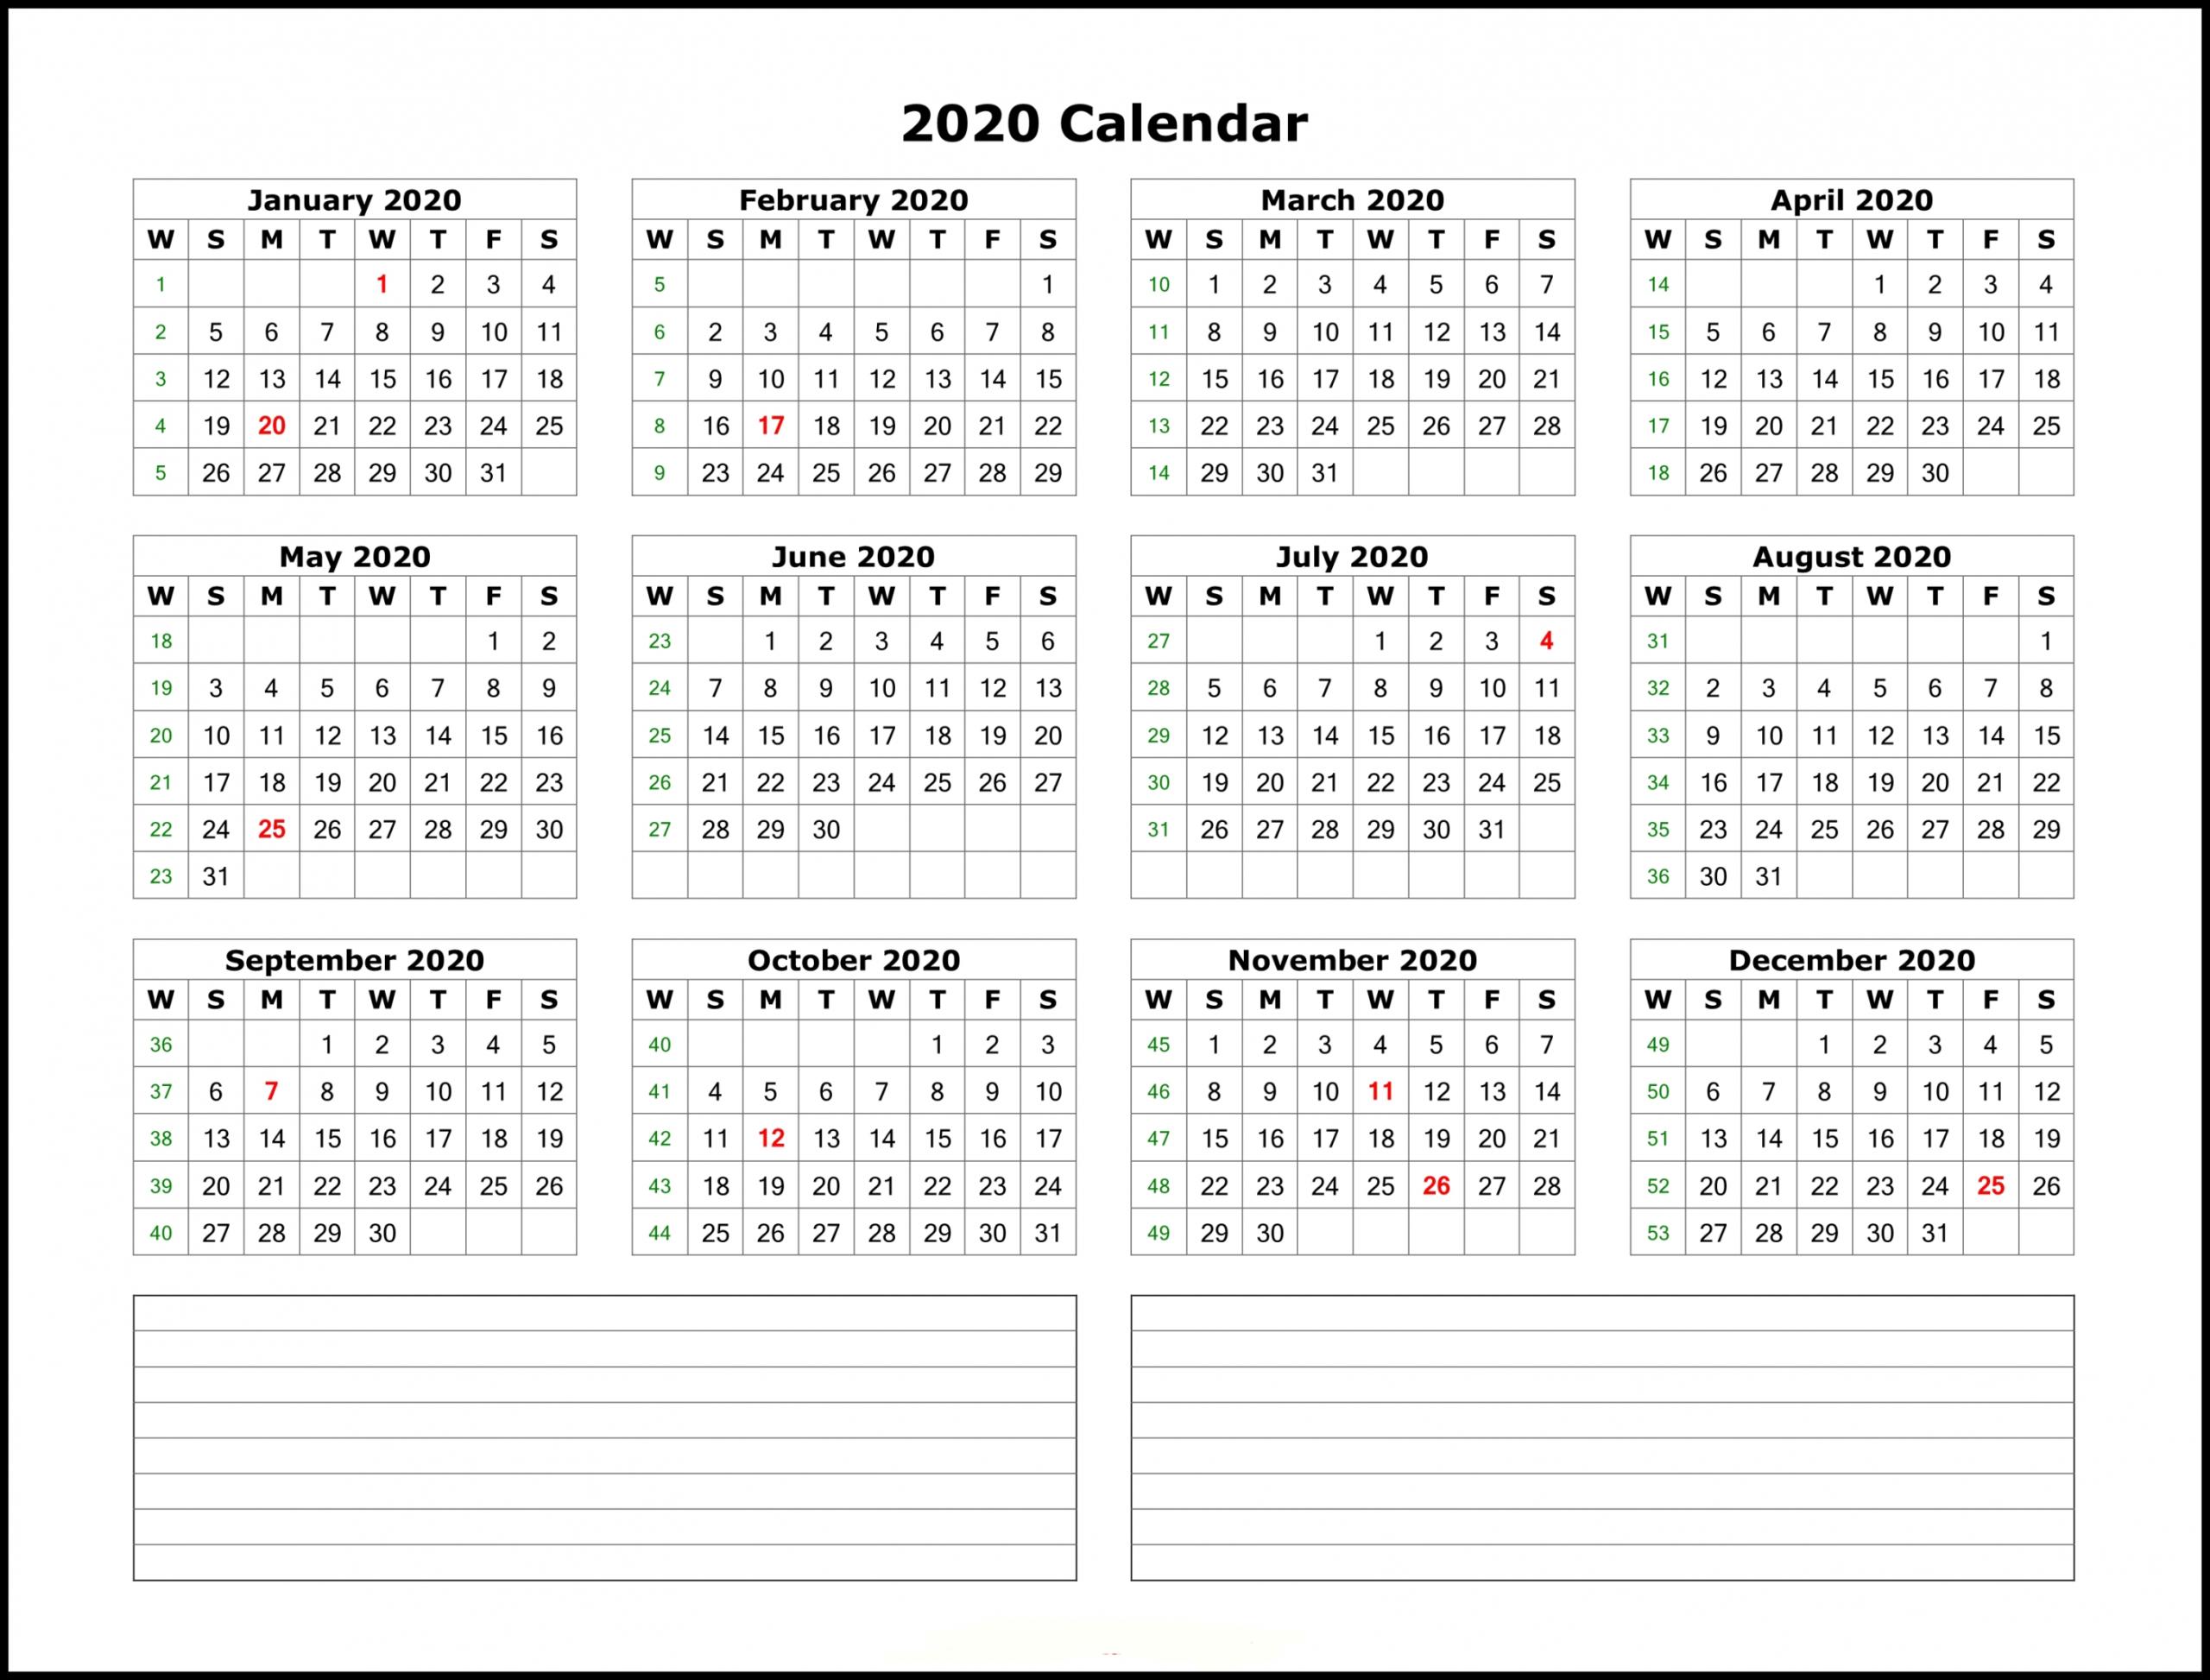 2020 Year Calendar Printable – 2020(이미지 포함)   달력, 배경화면, 패턴 Free Printable 5 Year Calendar